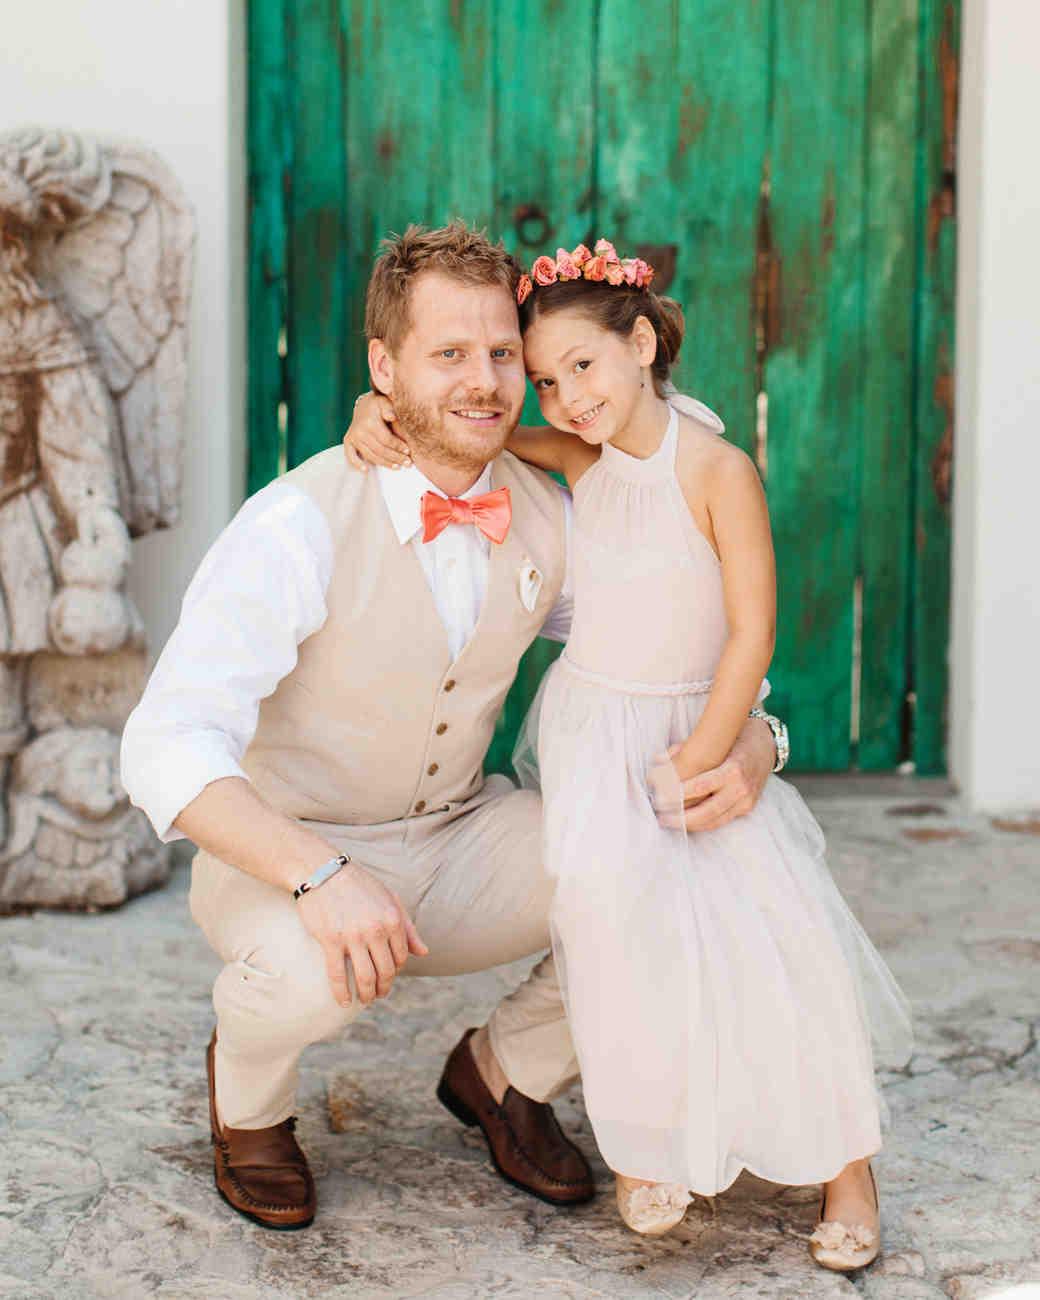 erica-steve-wedding-daughter-0214.jpg